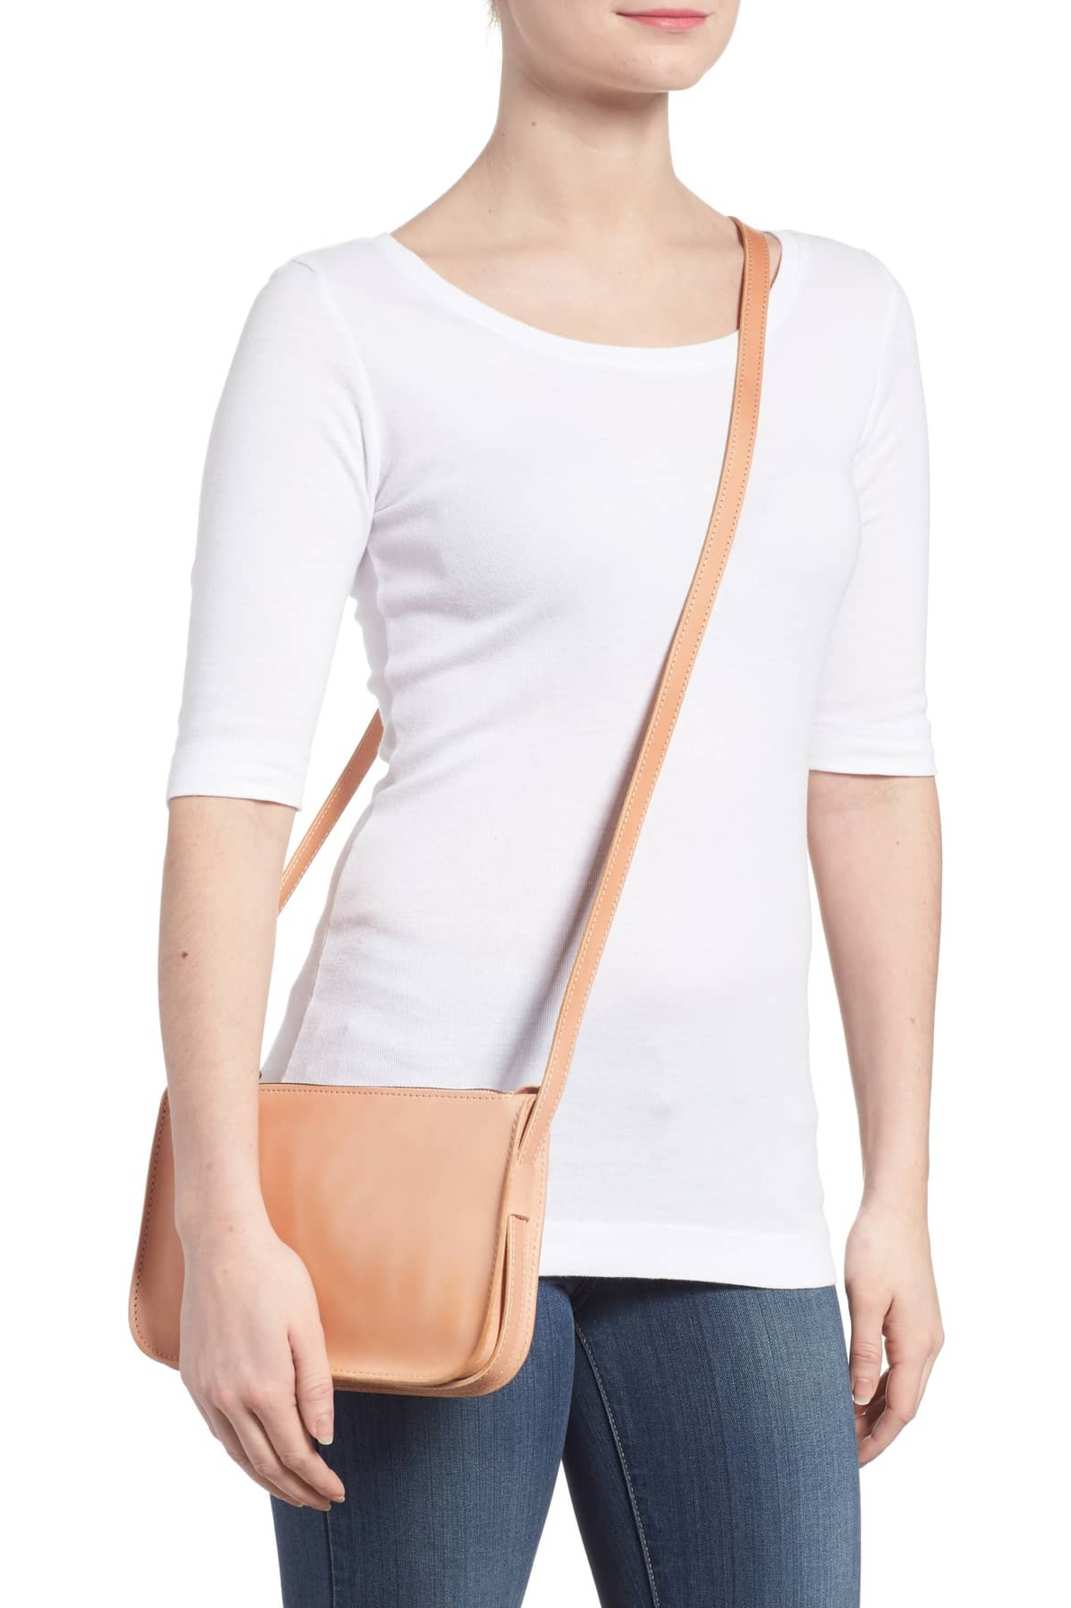 Madewell Simple Leather Crossbody Bag